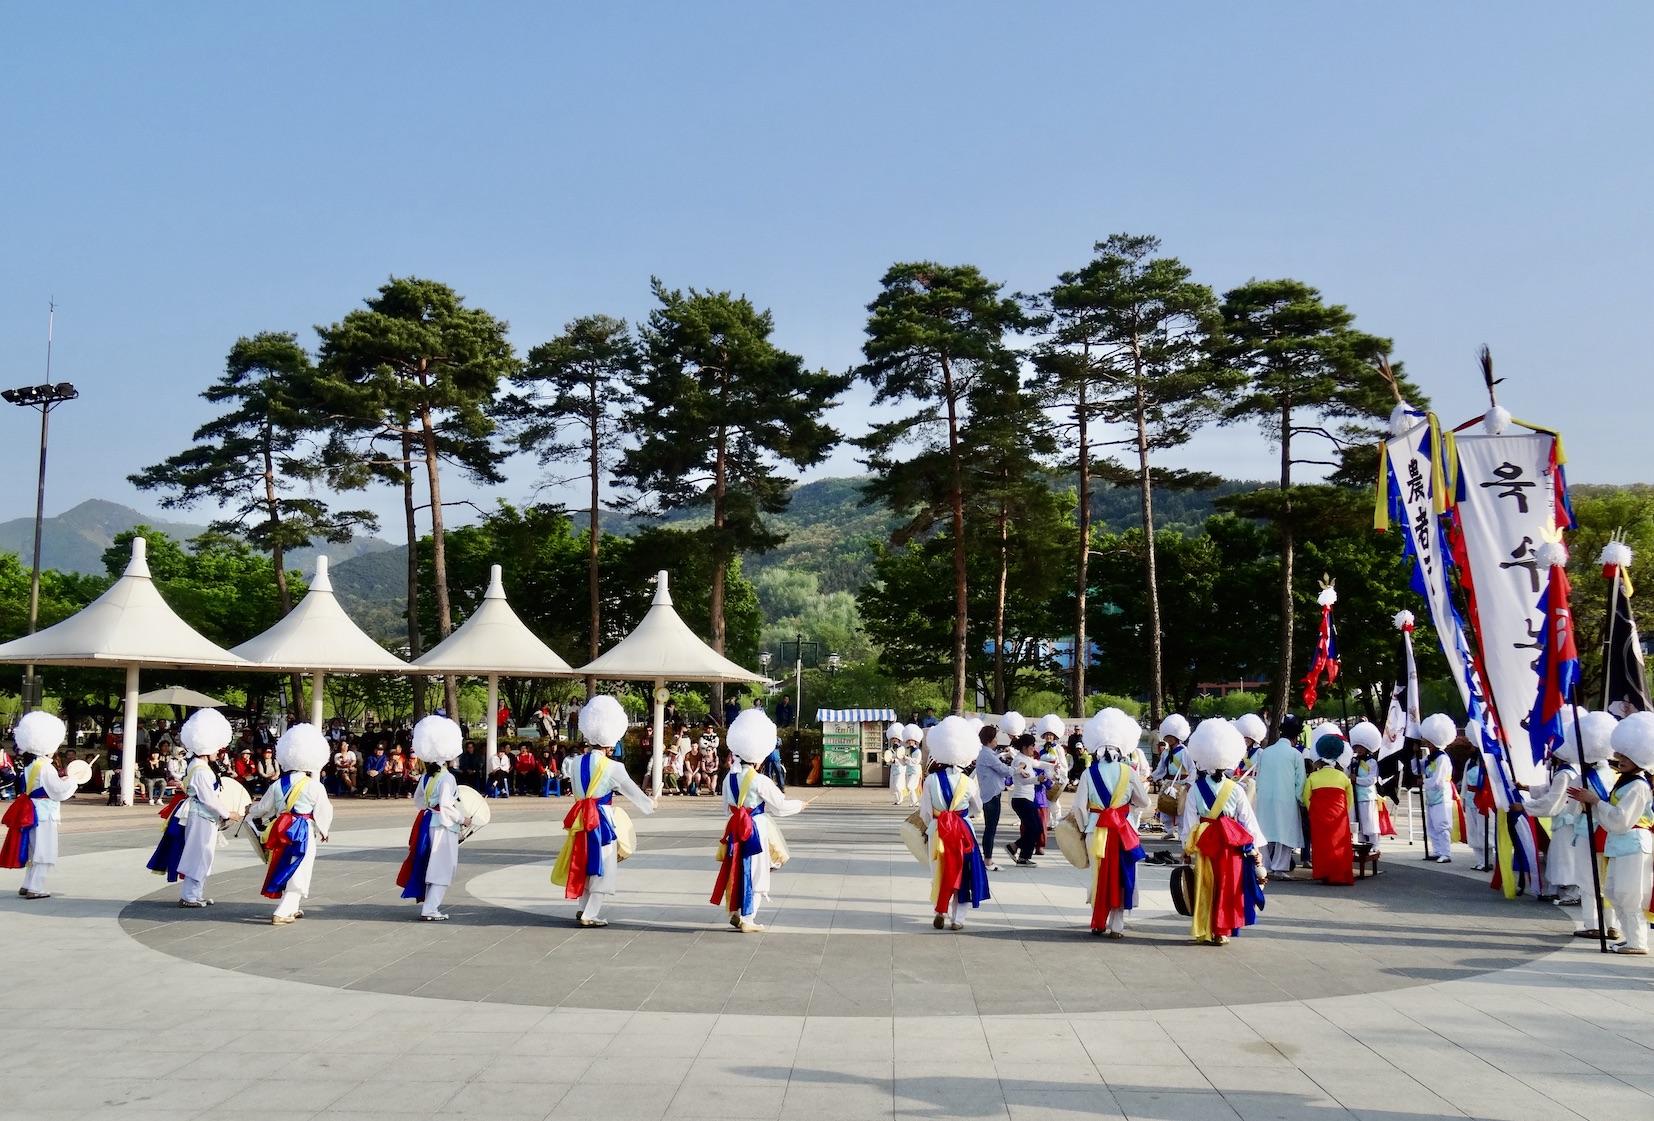 Pungmul performance Daegu South Korea.